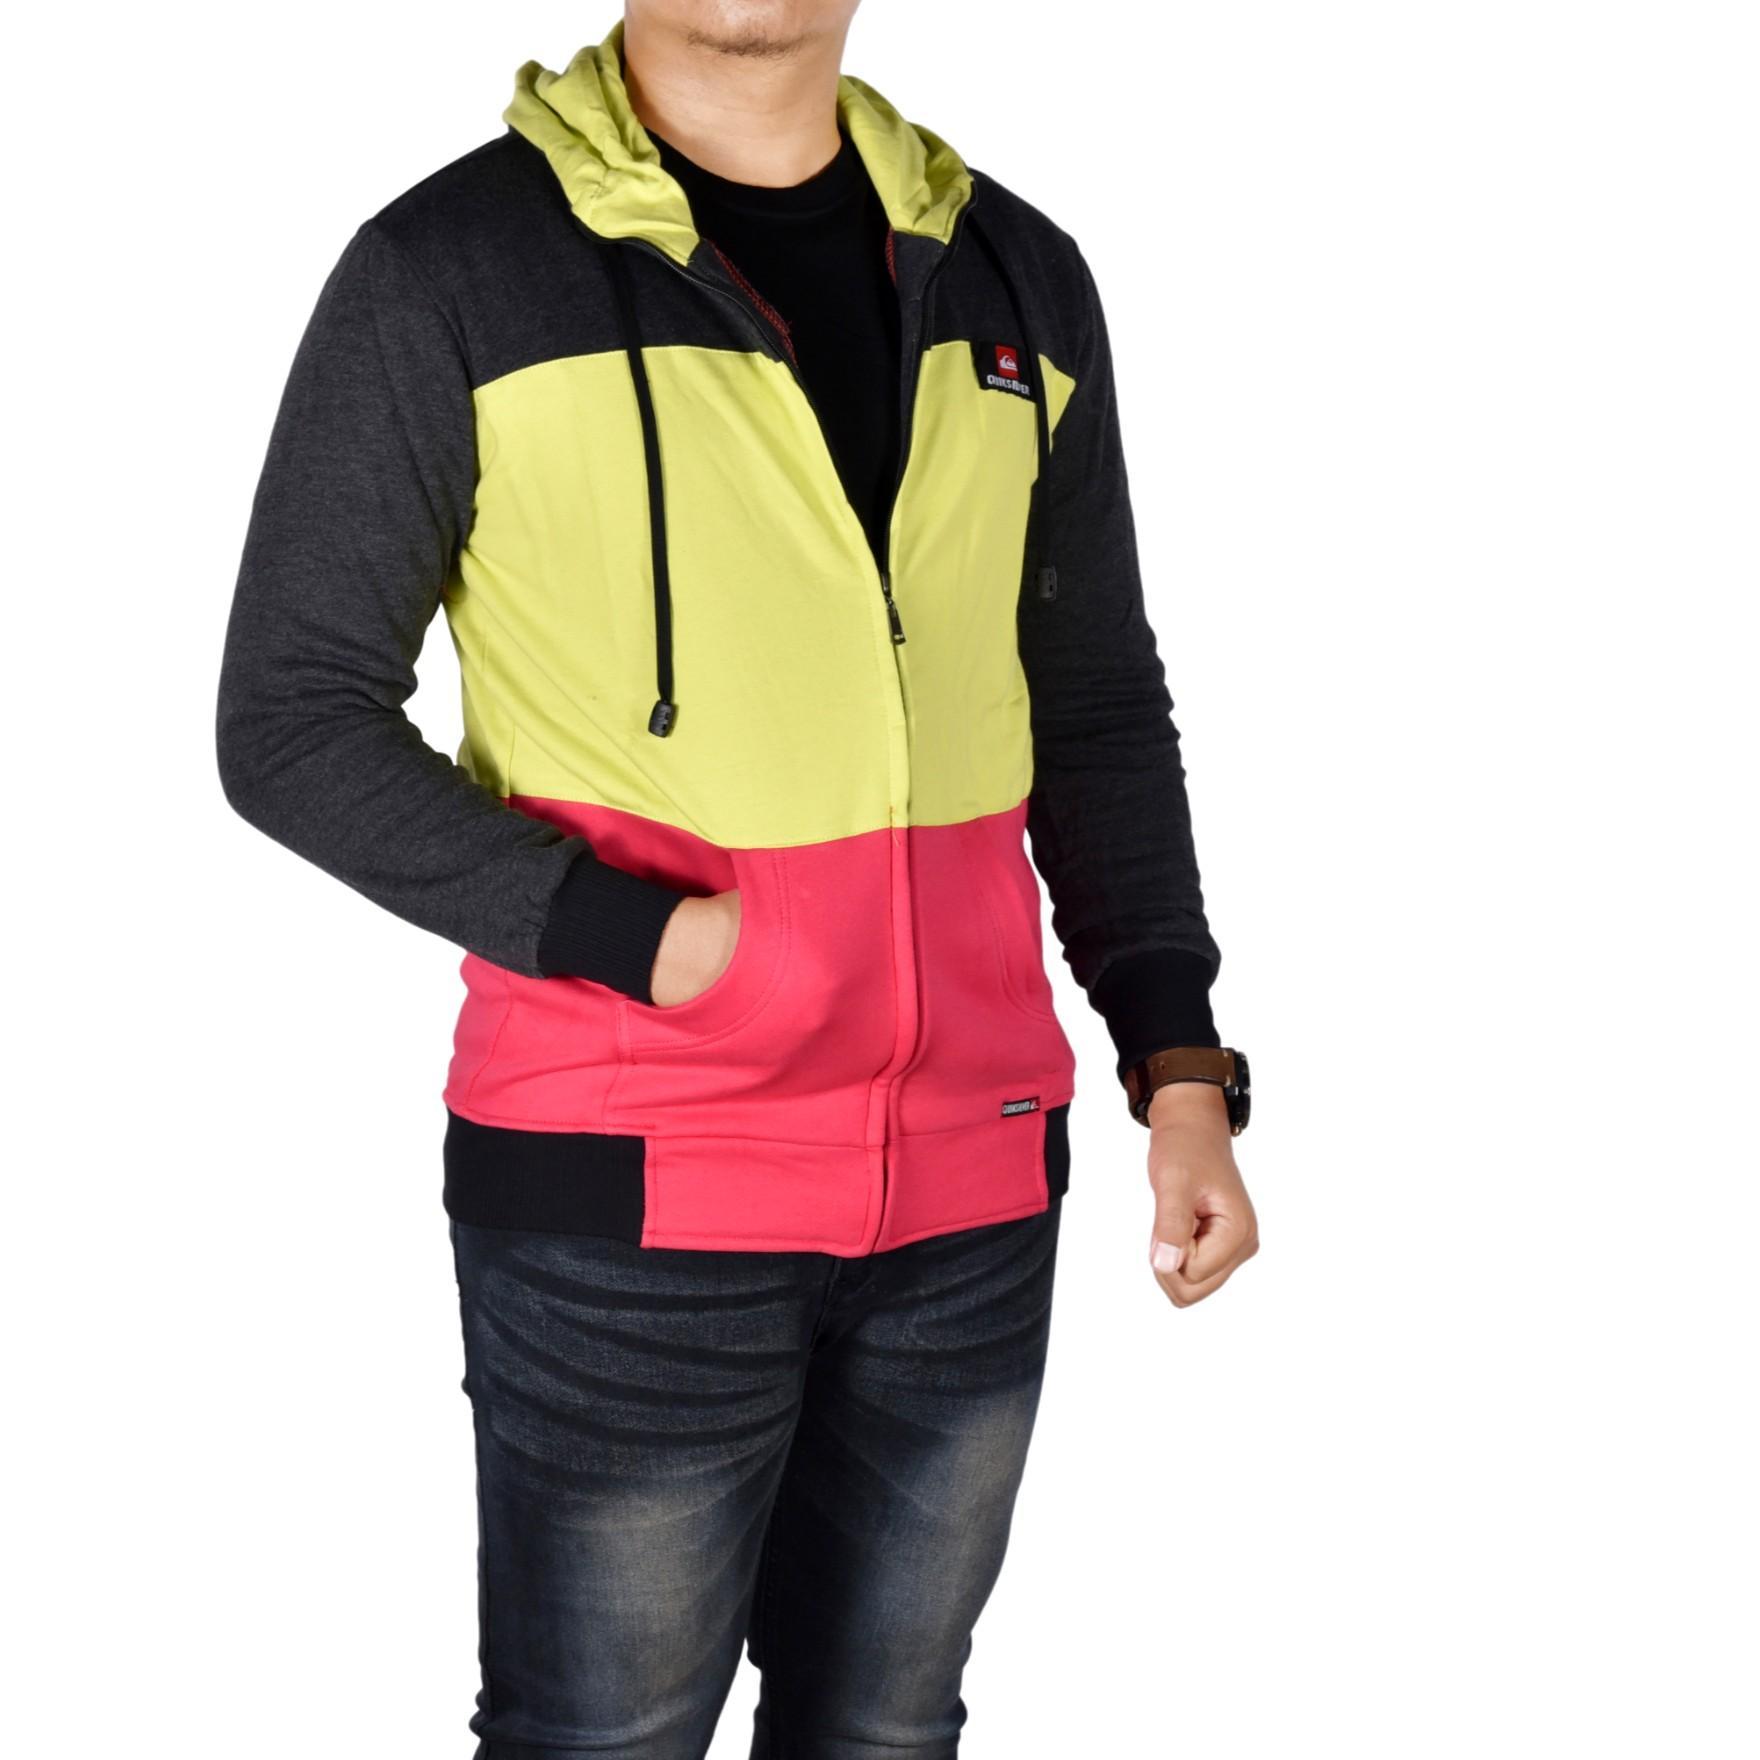 Dgm_Fashion1 Jaket Polos Combinasi Warna Korea /Jaket Denim/Jaket Parasut Pria/Jaket Bomber Pria/Ja